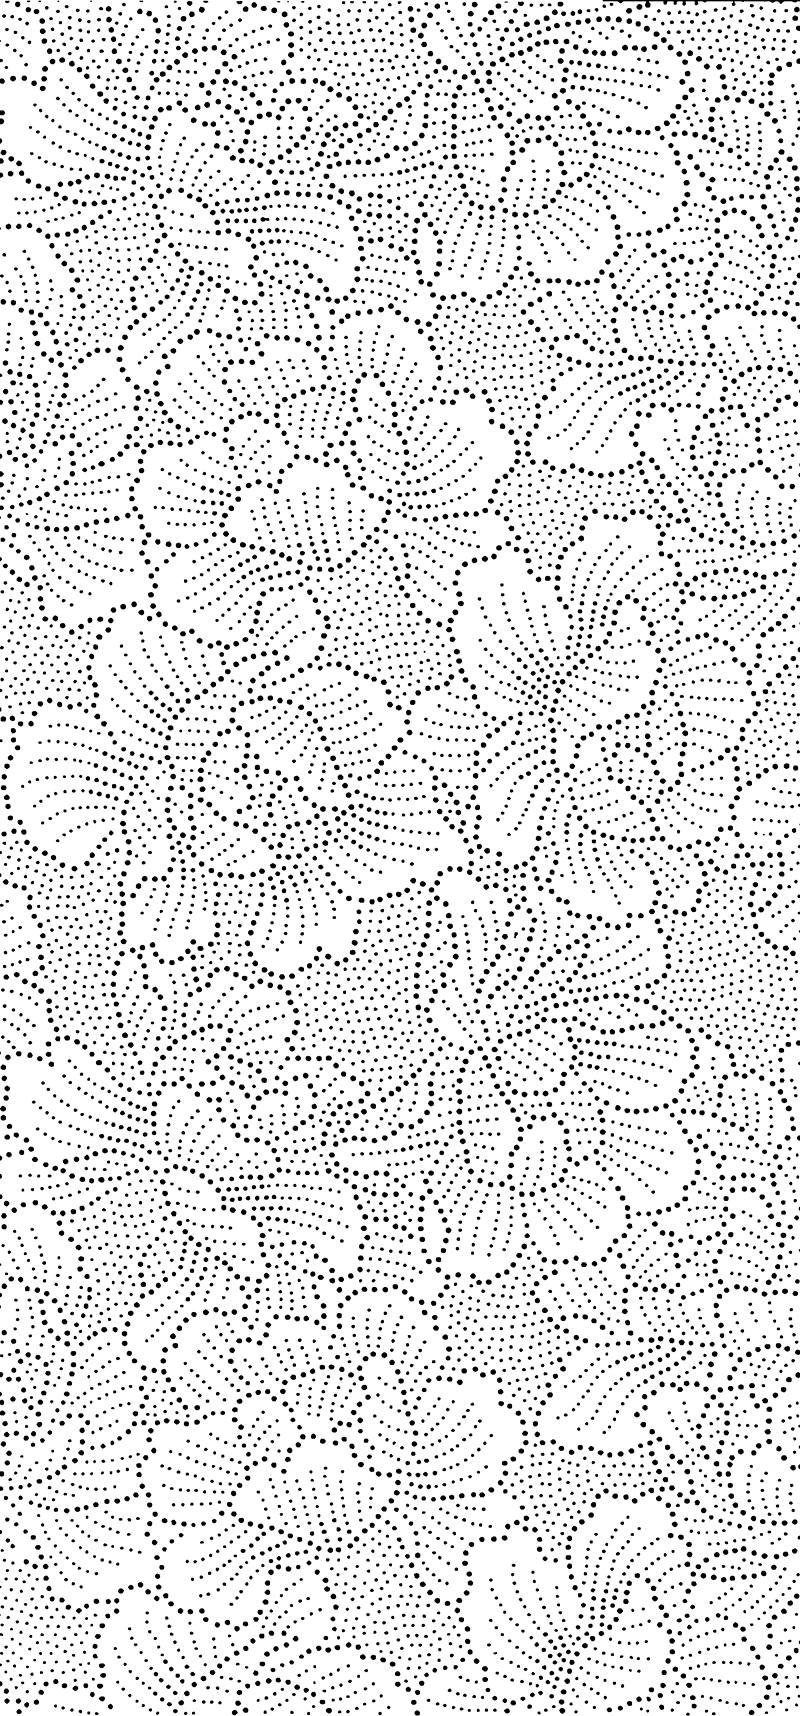 png800katagamipeonycolor3.png